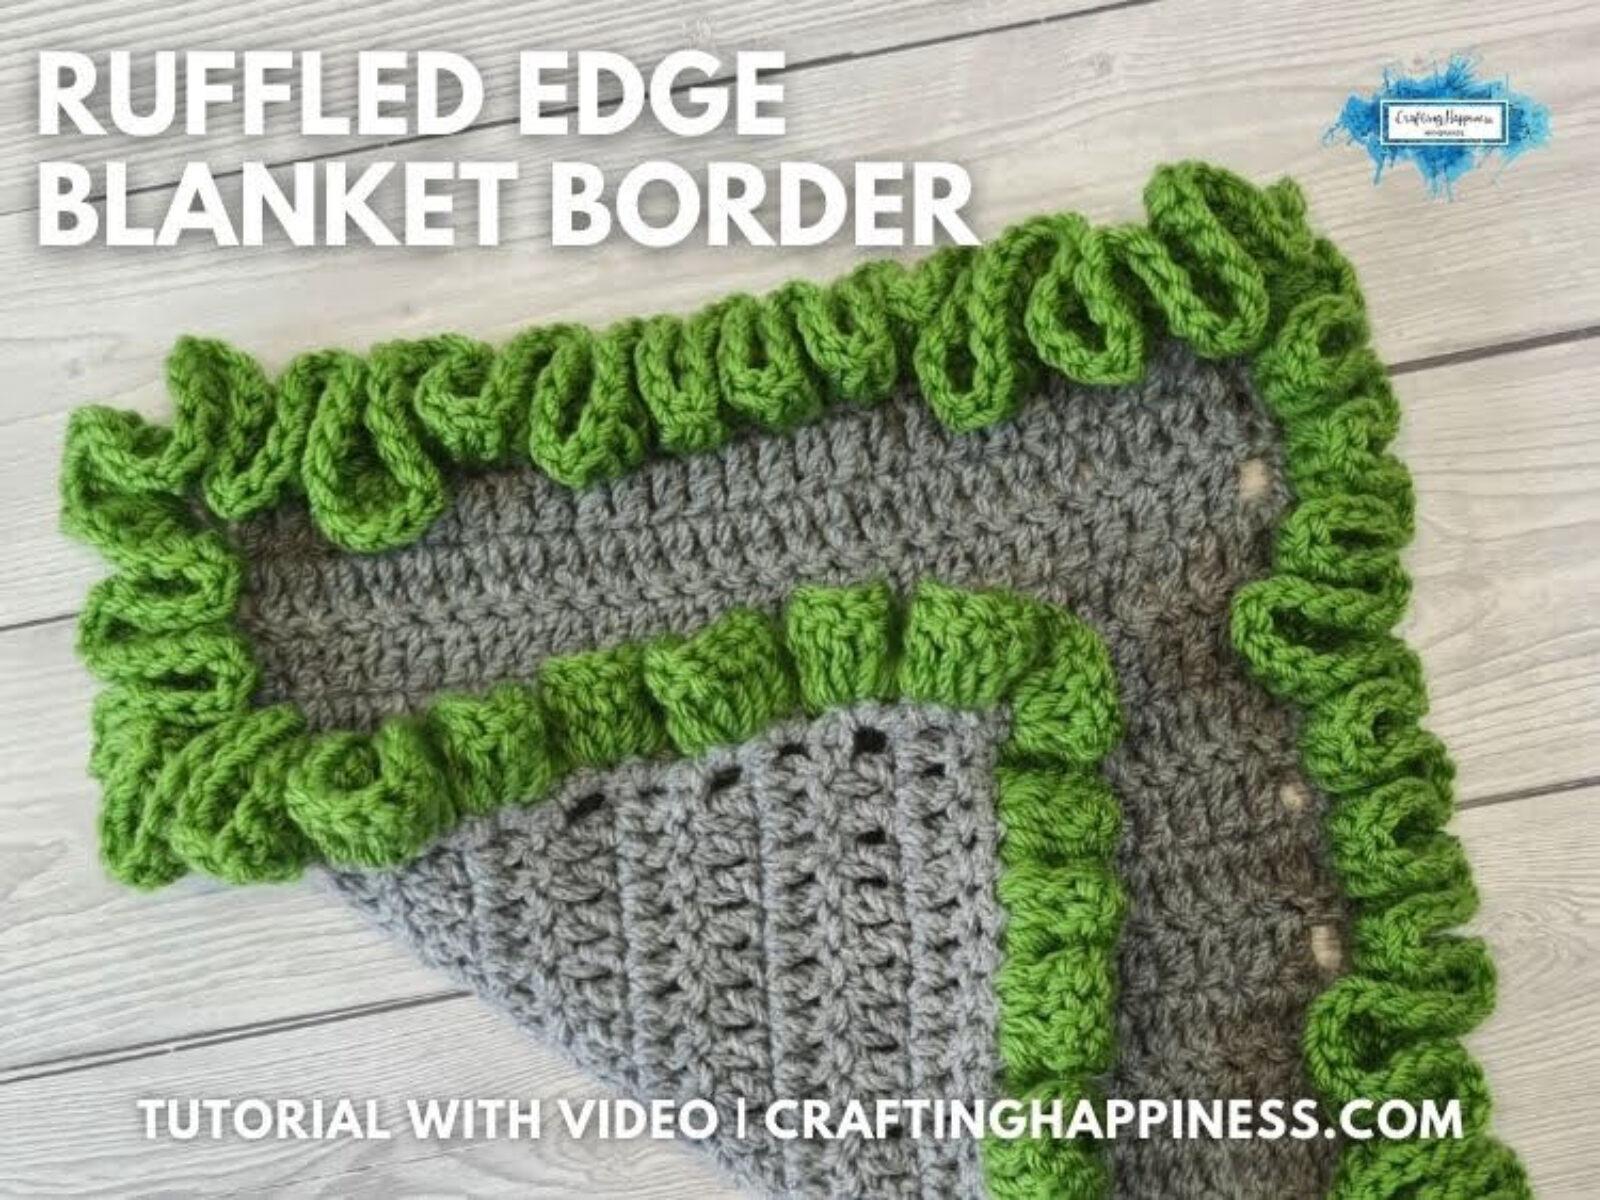 FB BLOG POSTER - Ruffled Edge Blanket Border Crafting Happiness